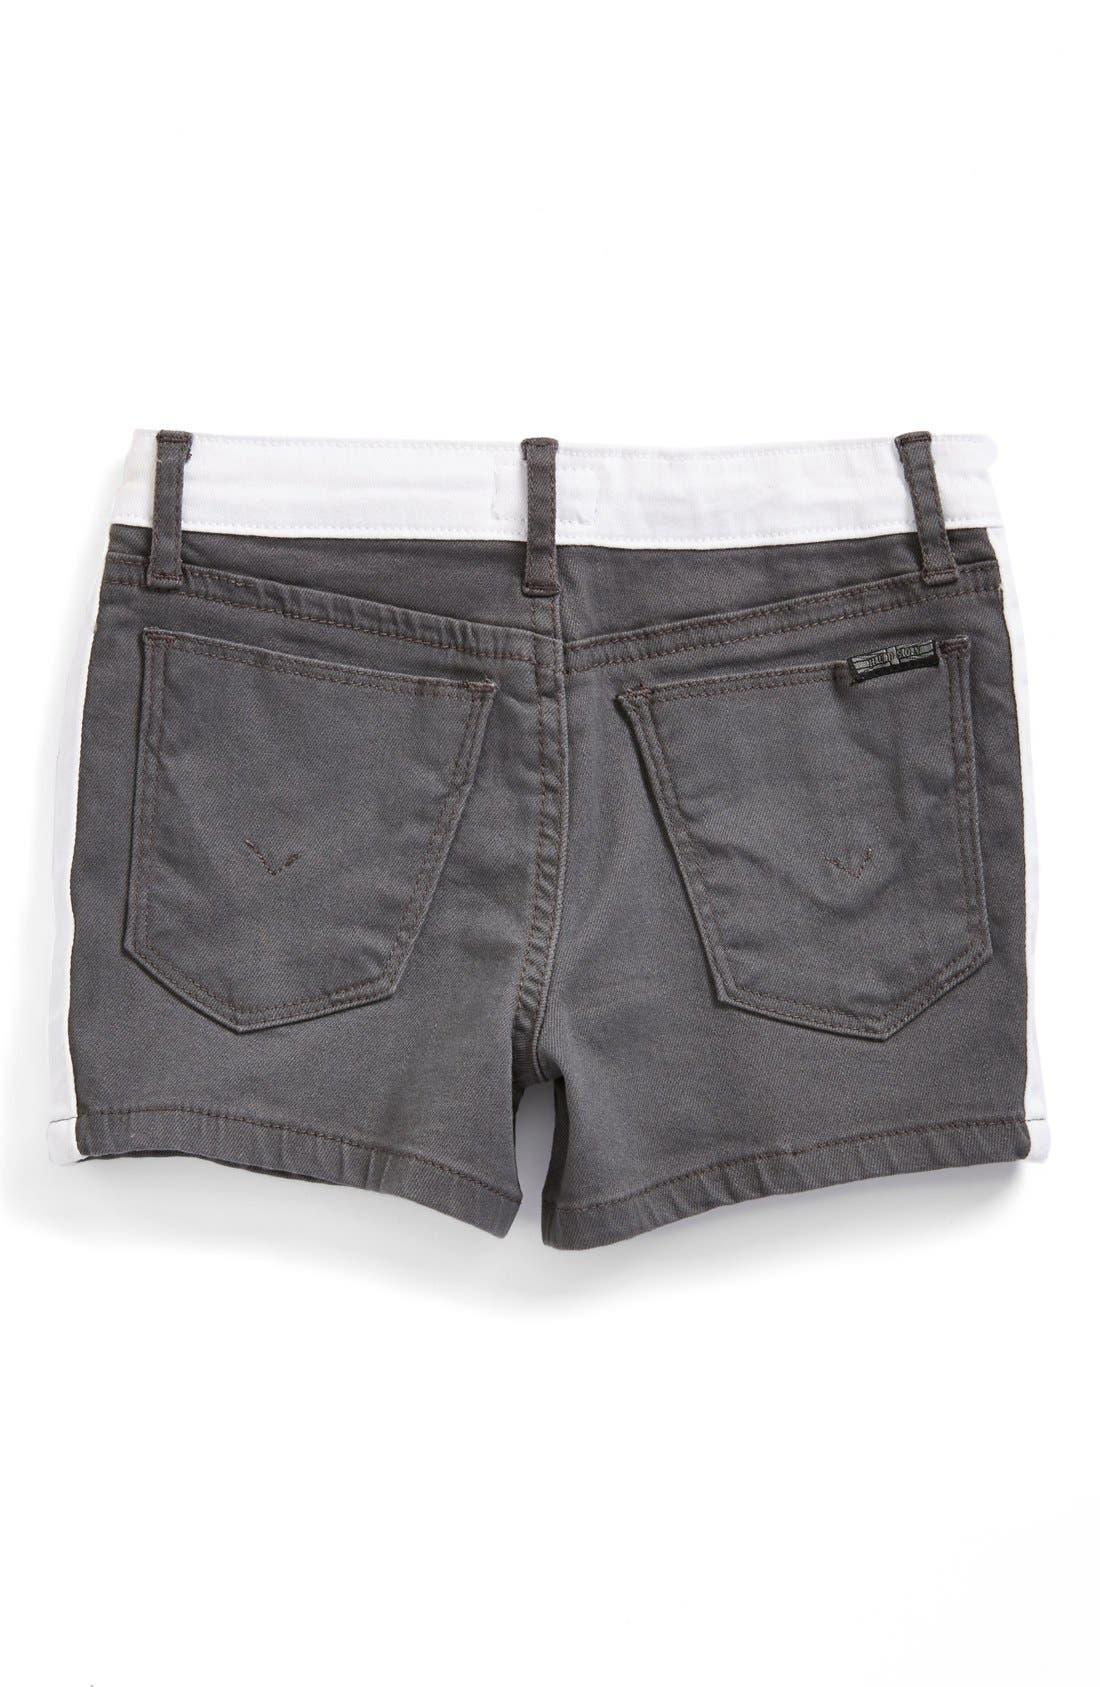 Main Image - Hudson Kids 'Leeloo' Shorts (Little Girls & Big Girls)(Online Only)